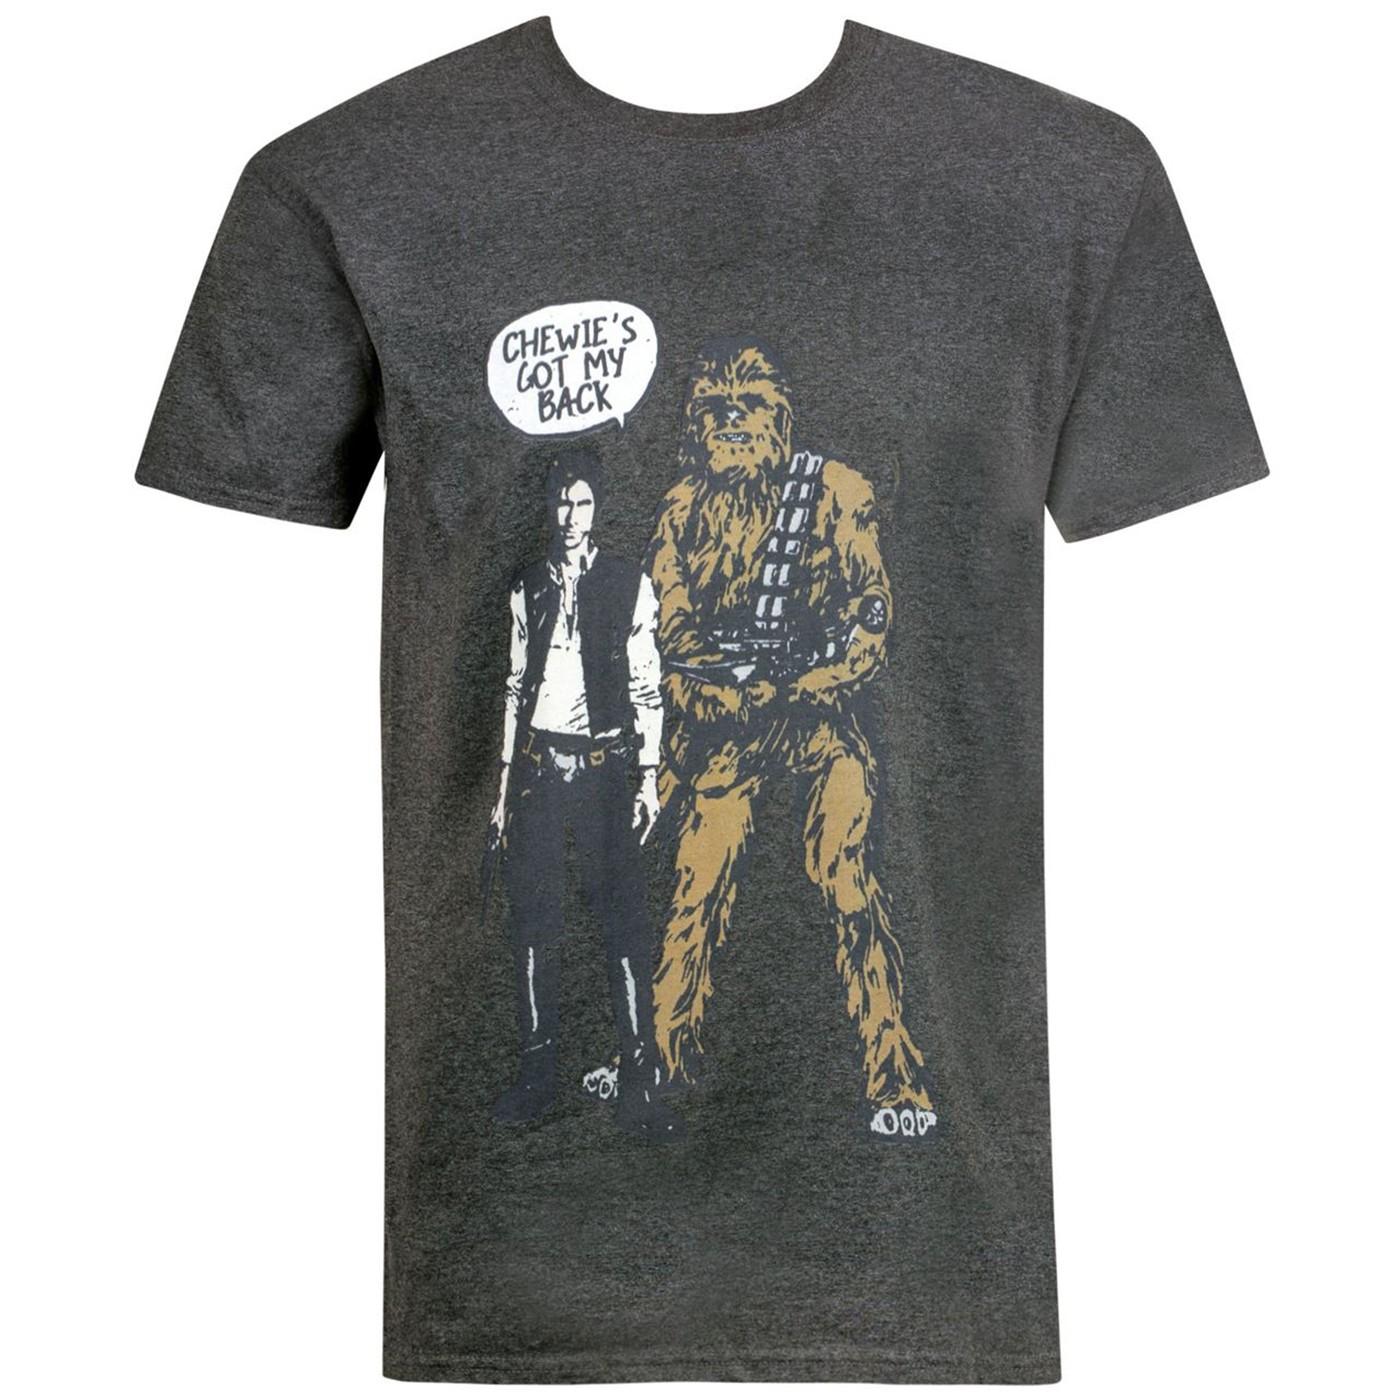 Star Wars Chewy's Got My Back Men's T-Shirt